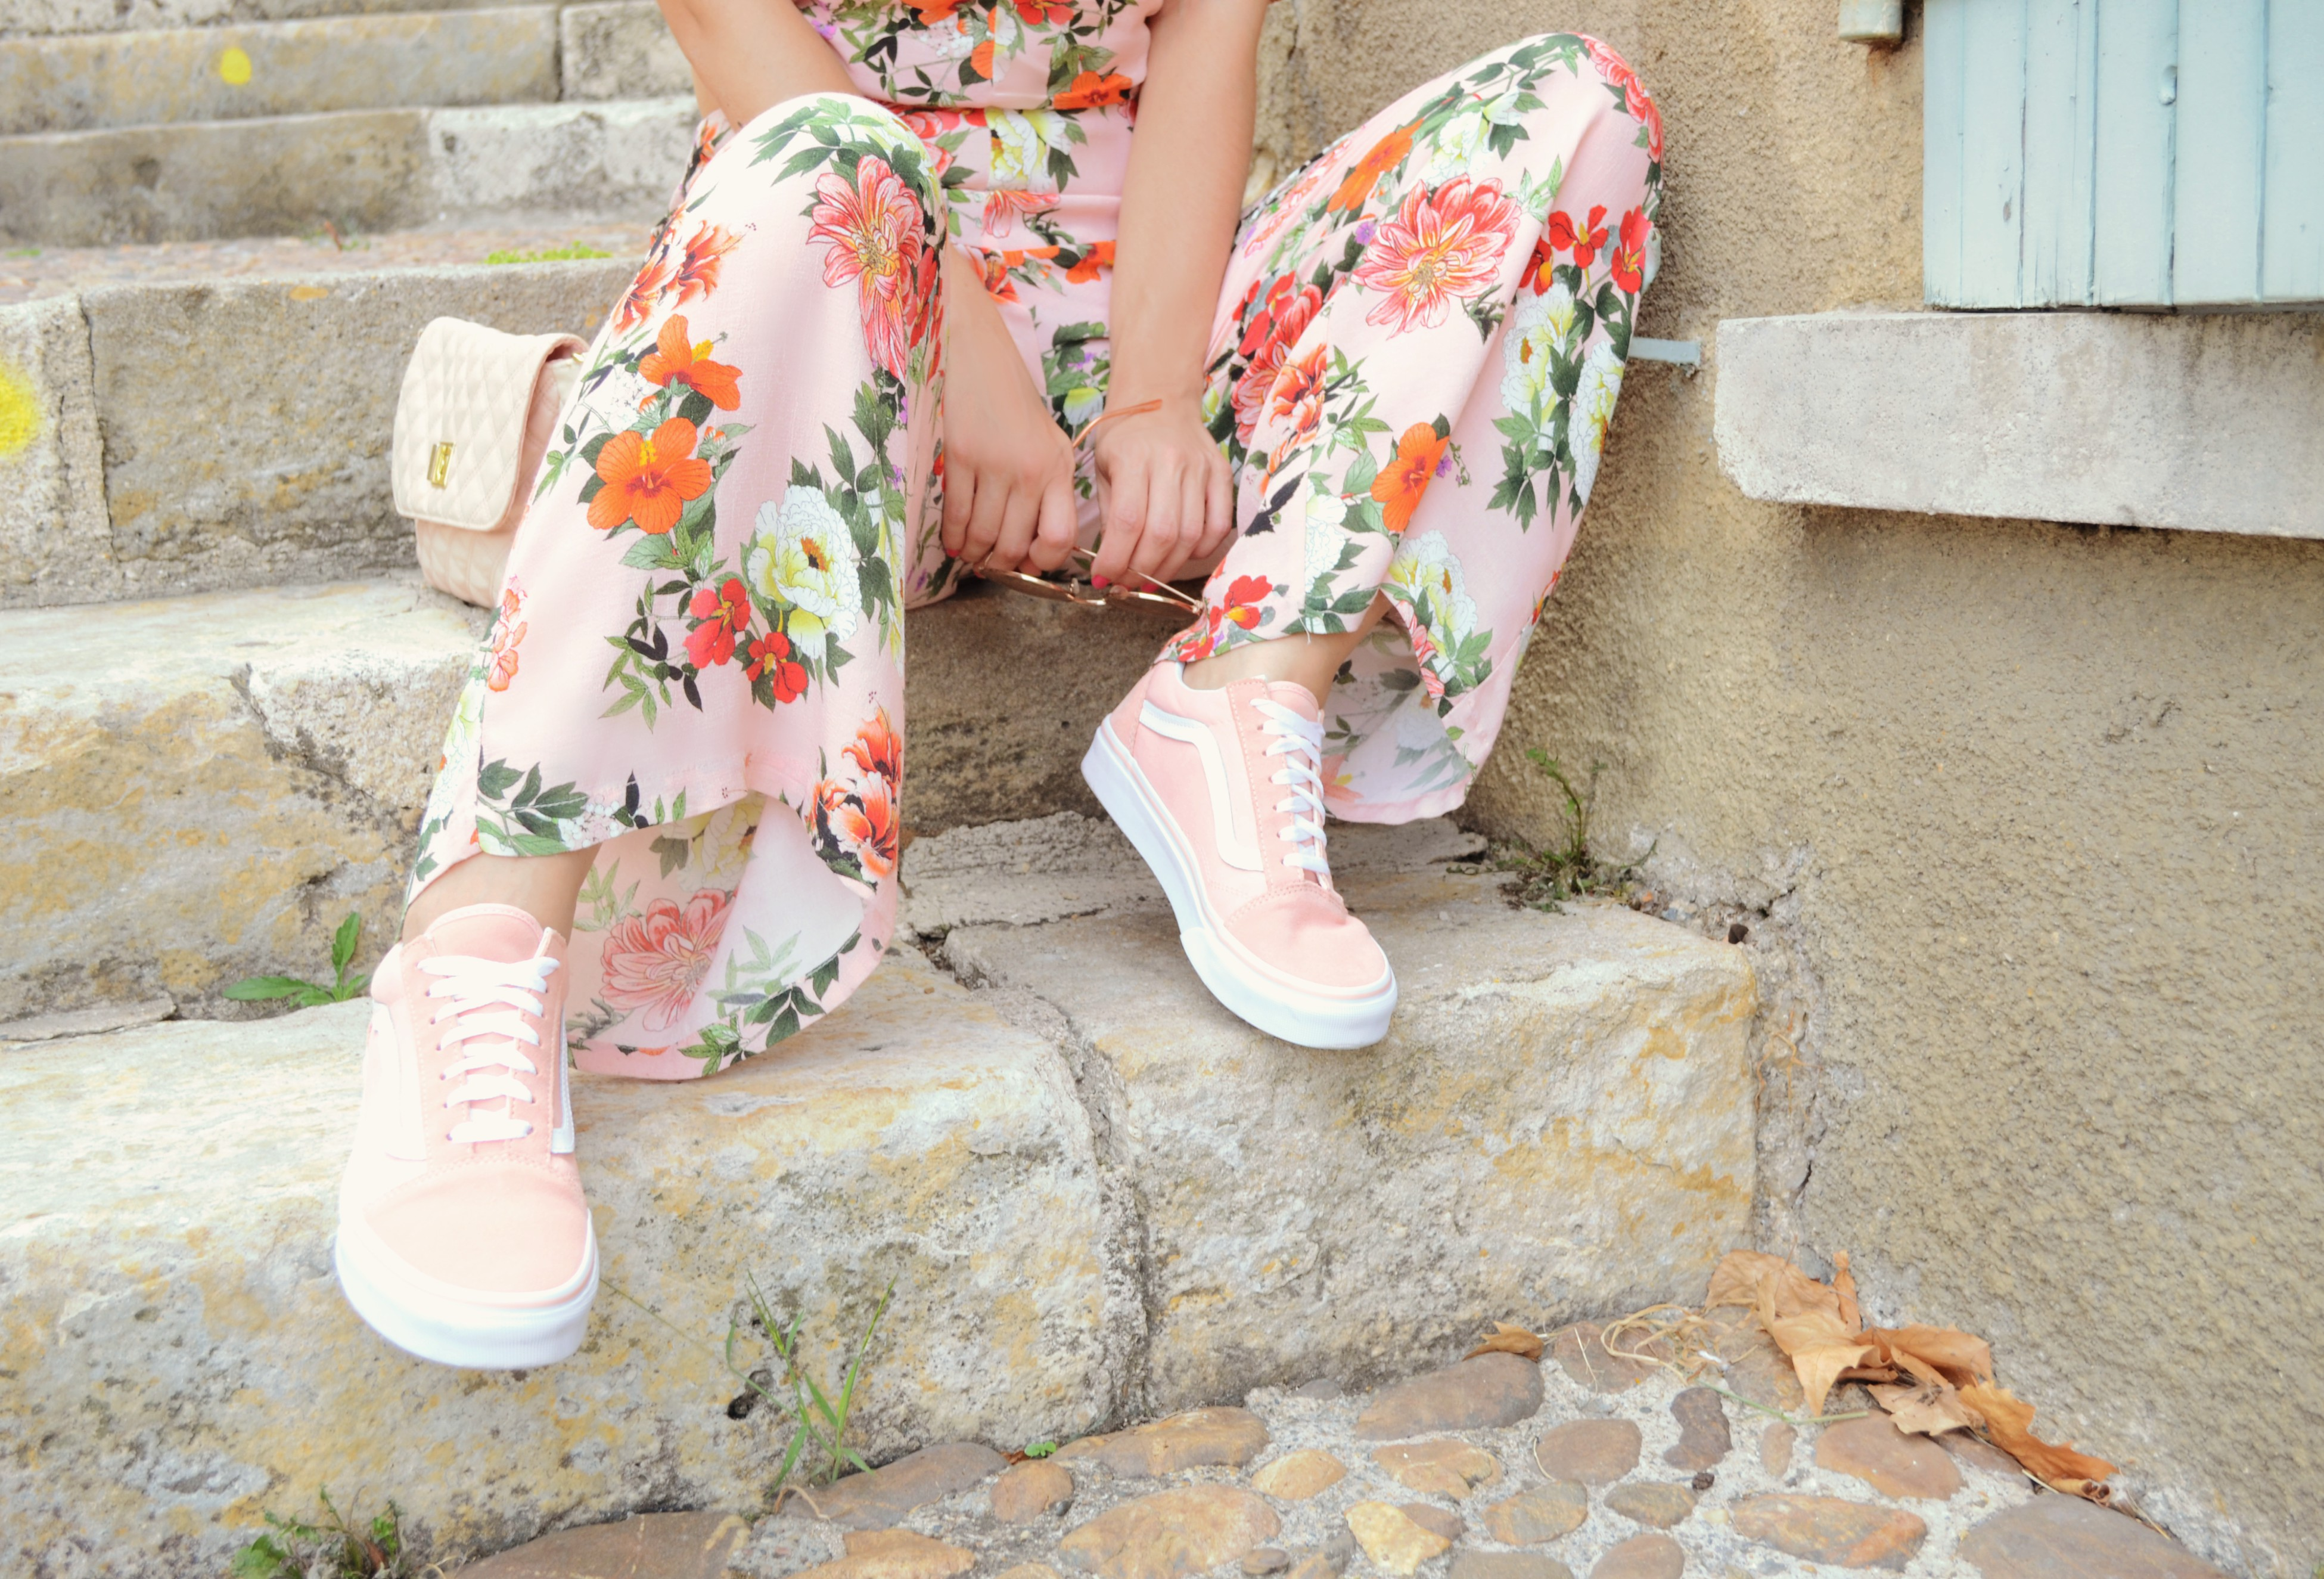 Vans-Old-Skool-jdsports-fashionista-ChicAdicta-blog-de-moda-Chic-Adicta-influencer-mono-de-flores-bershka-PiensaenChic-Piensa-en-Chic